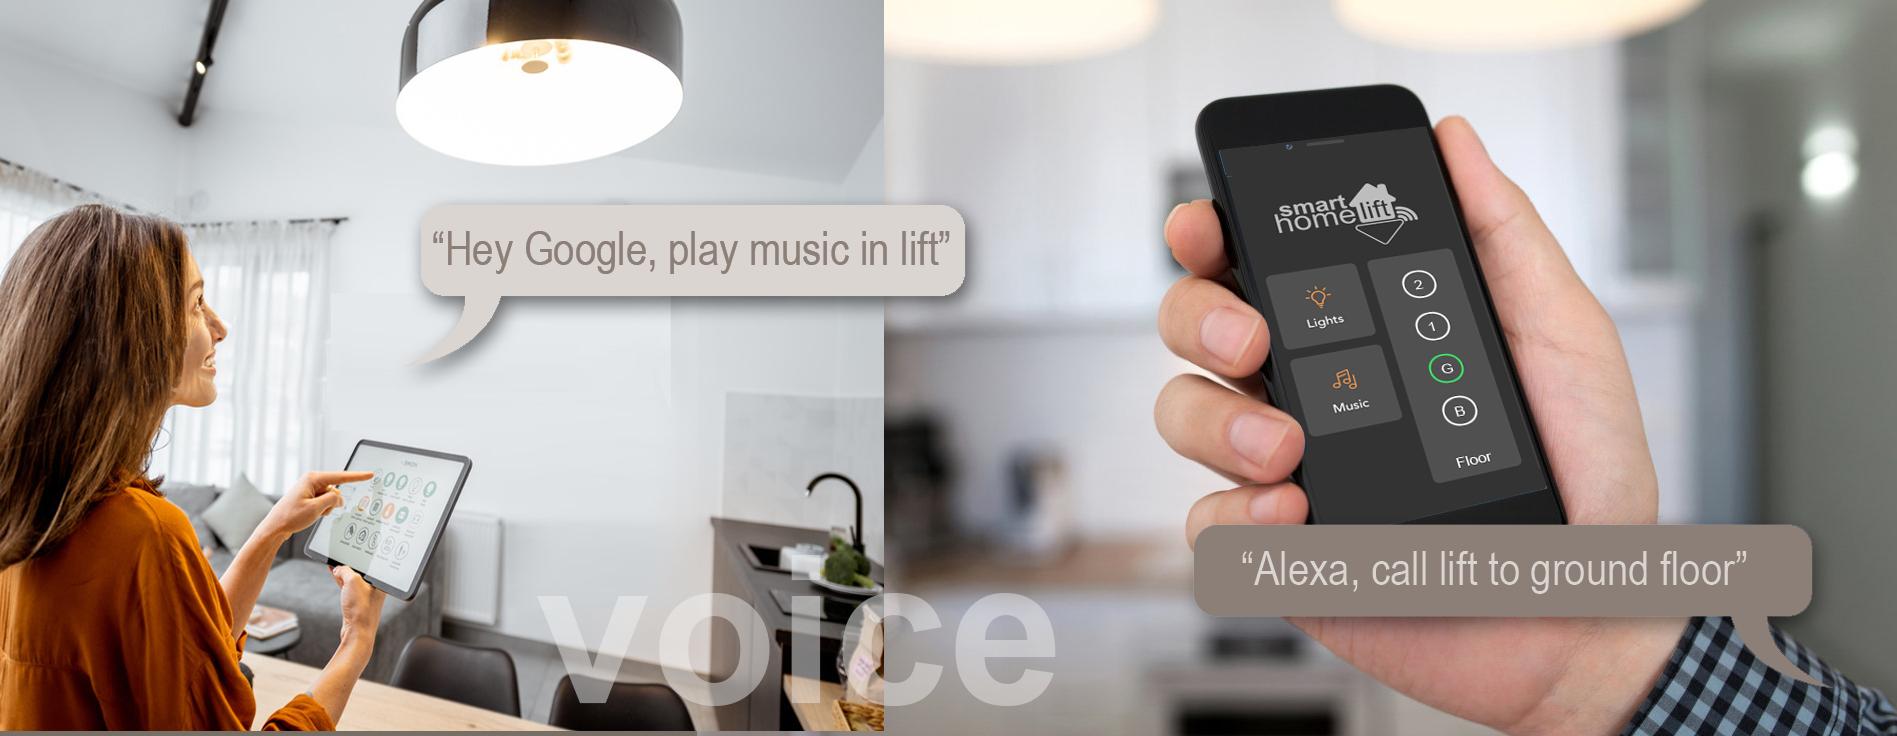 Voice recognition 3 - Smart Home Lift